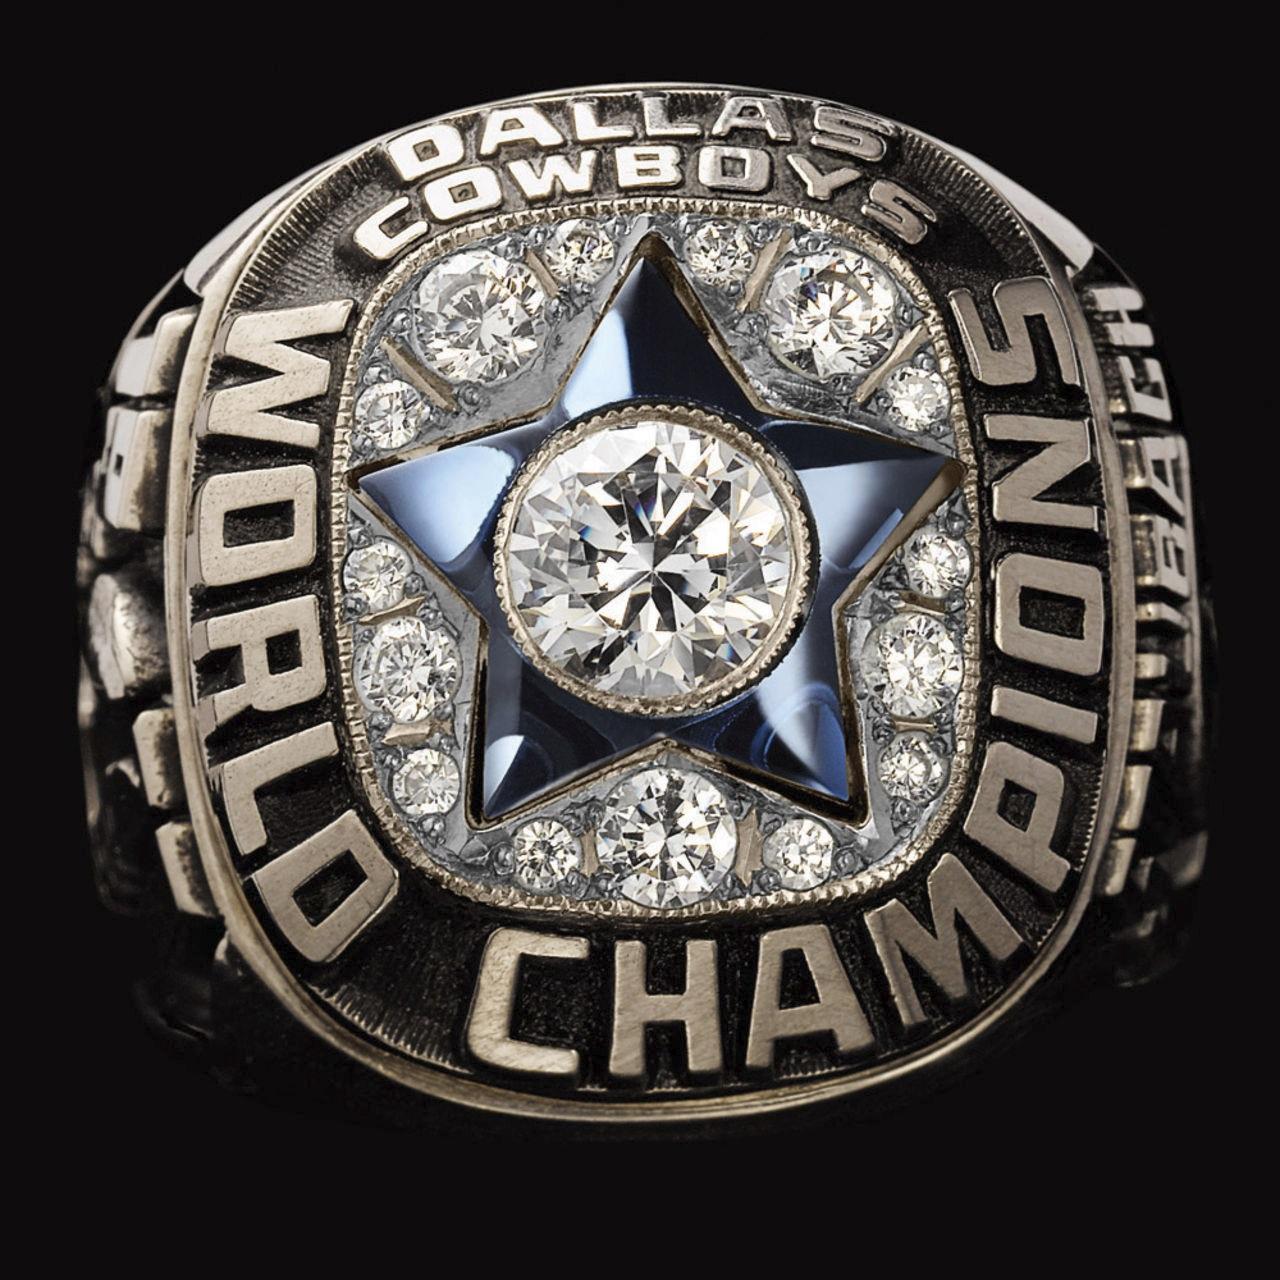 Dallas Cowboys 1972 champions ring